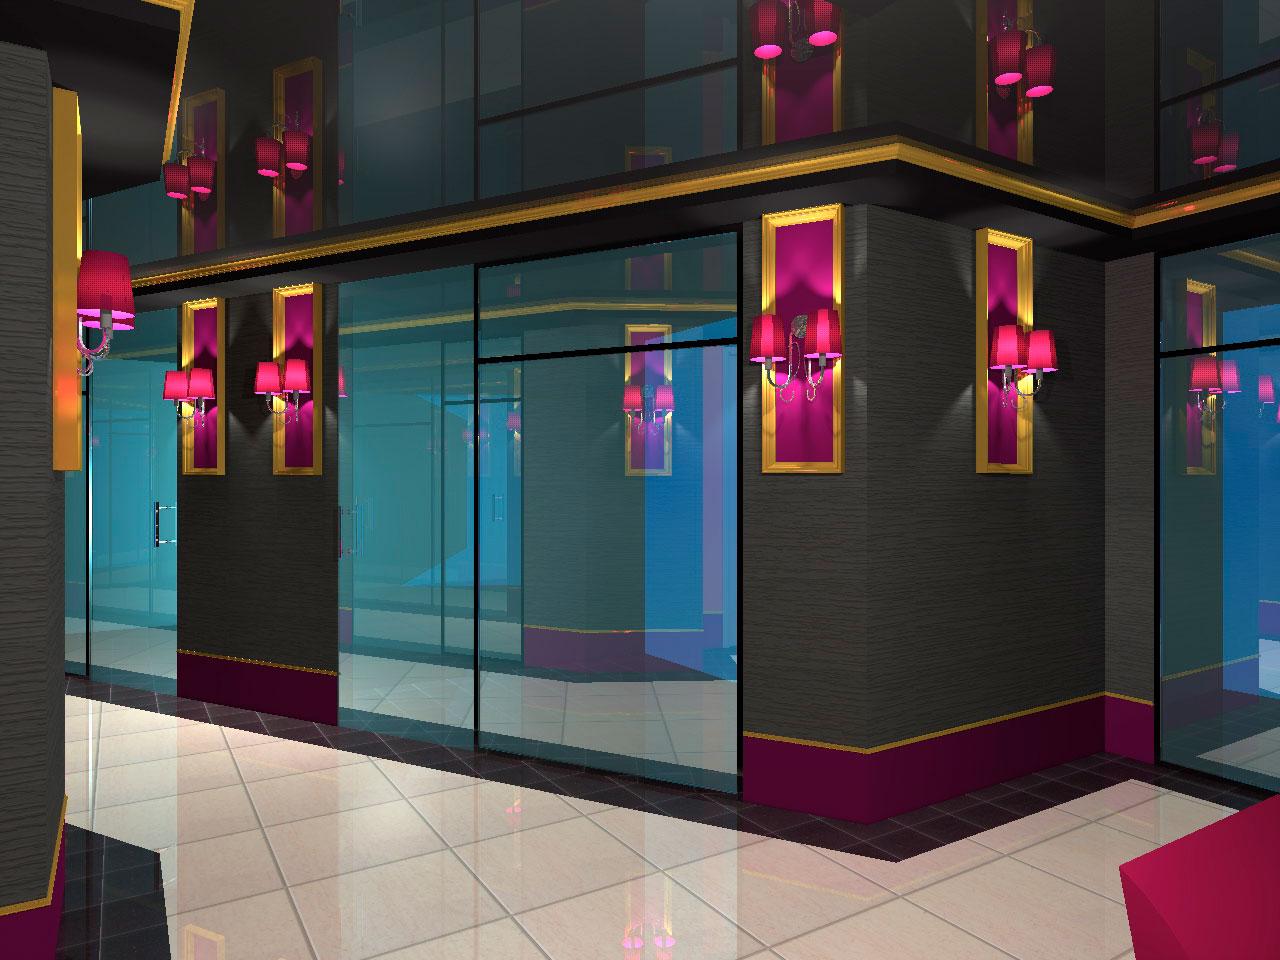 Разработка интерьера ресторана. 3D визуализация.